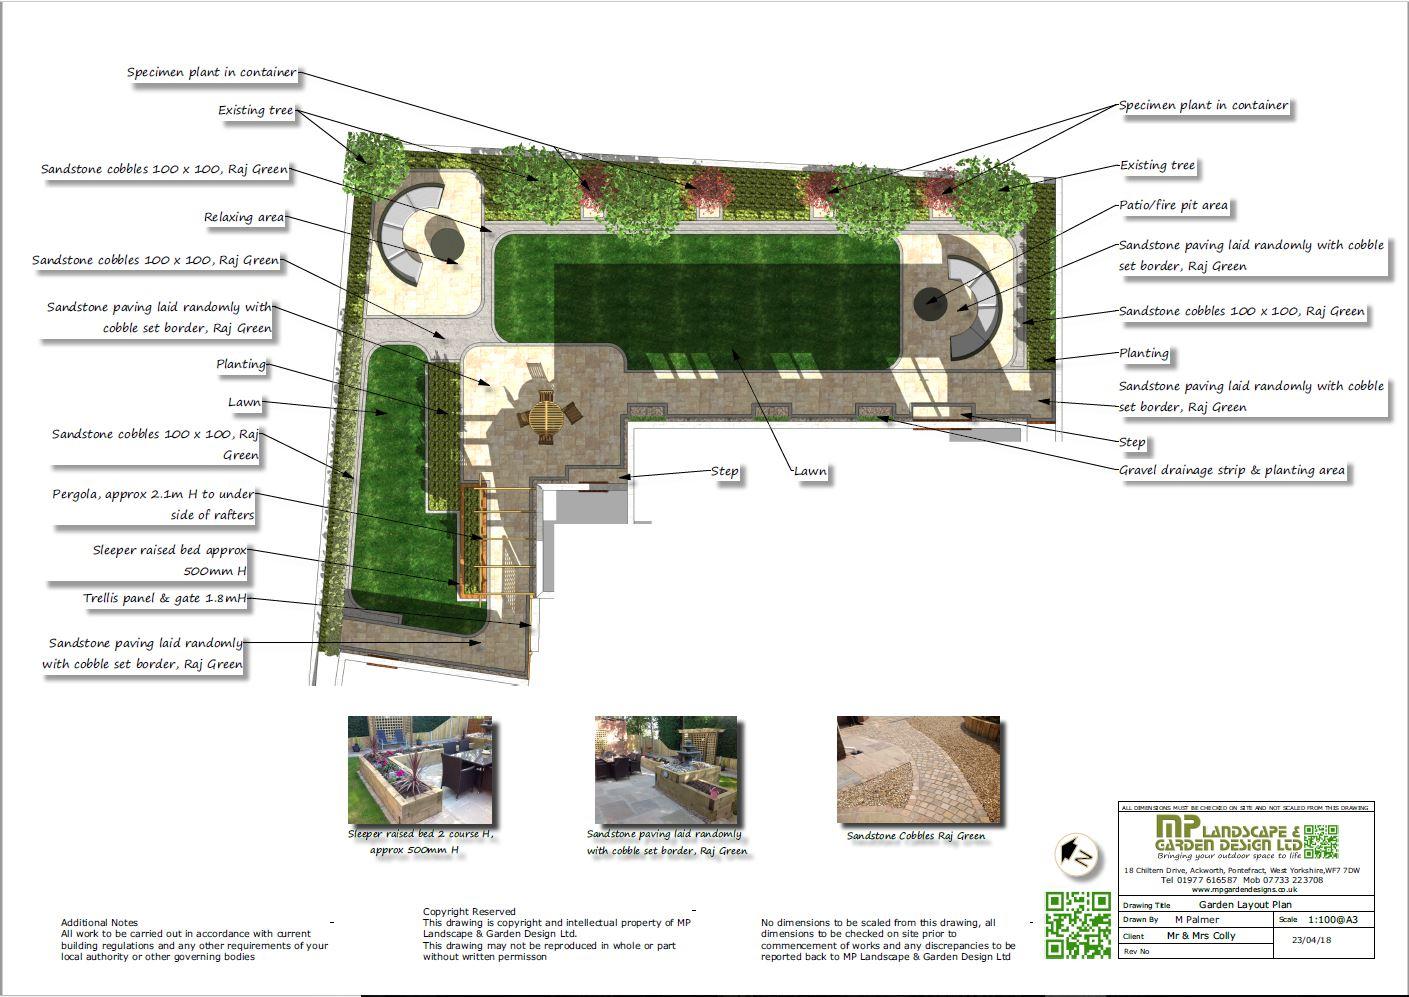 Garden layout plans for a rear garden in Wakefield, West Yorkshire.